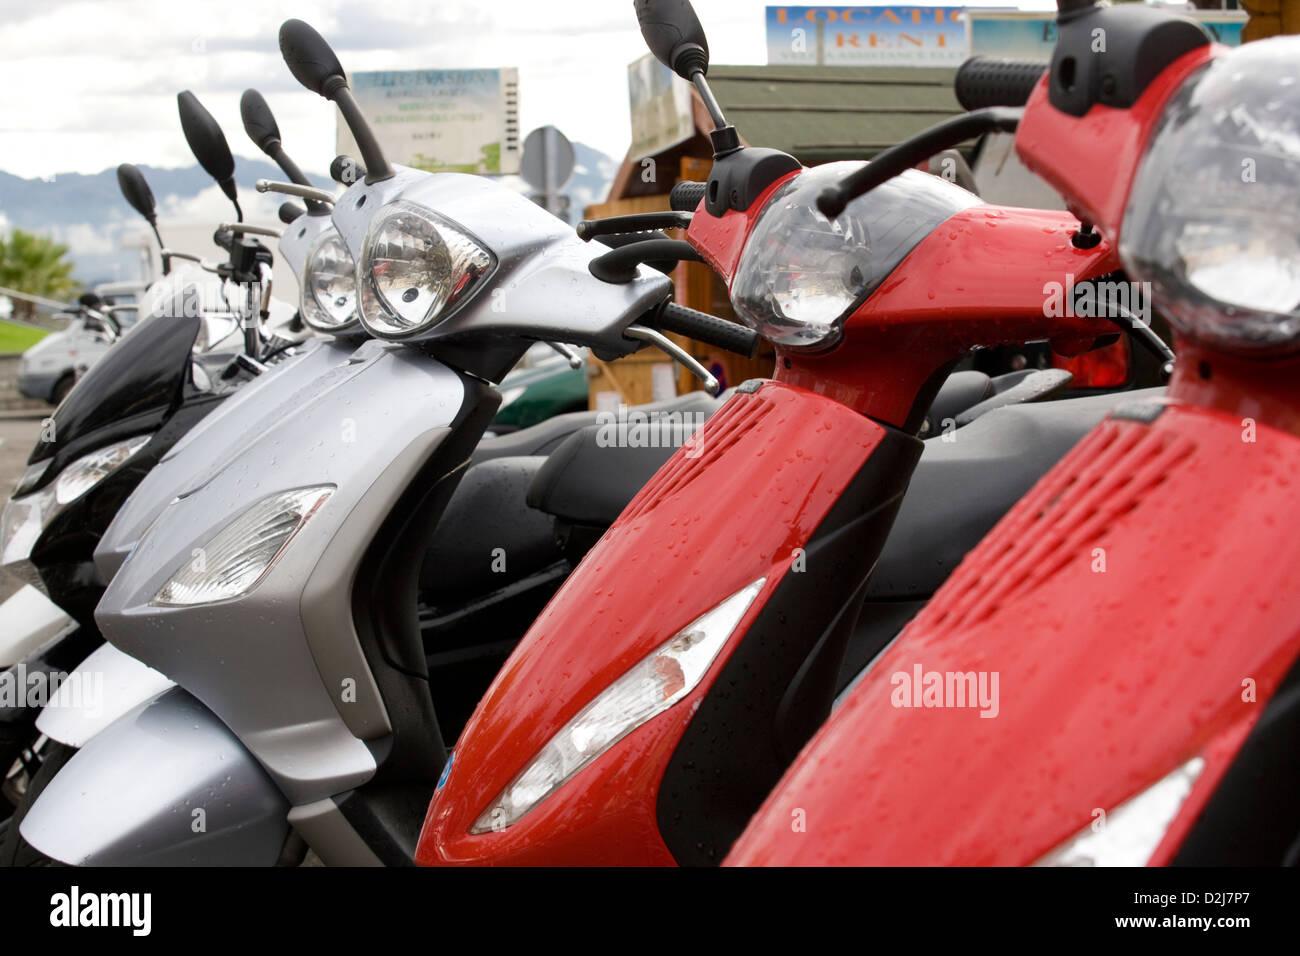 Corsica: Ajaccio - scooters - Stock Image